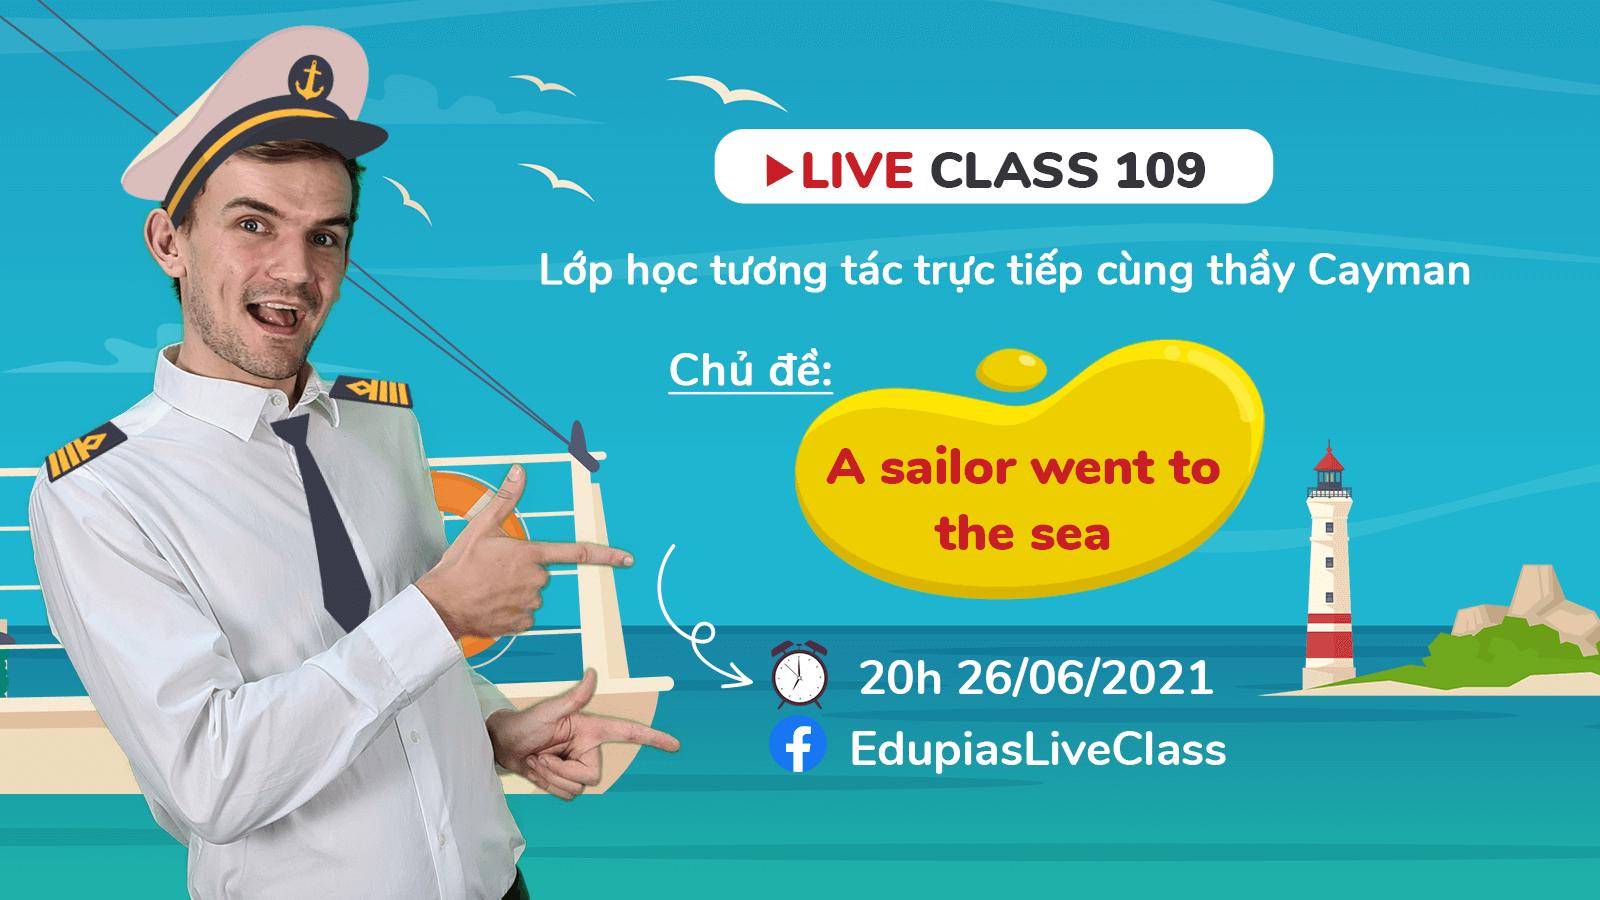 Live class tuần 109 - Chủ đề: A sailor went to the sea